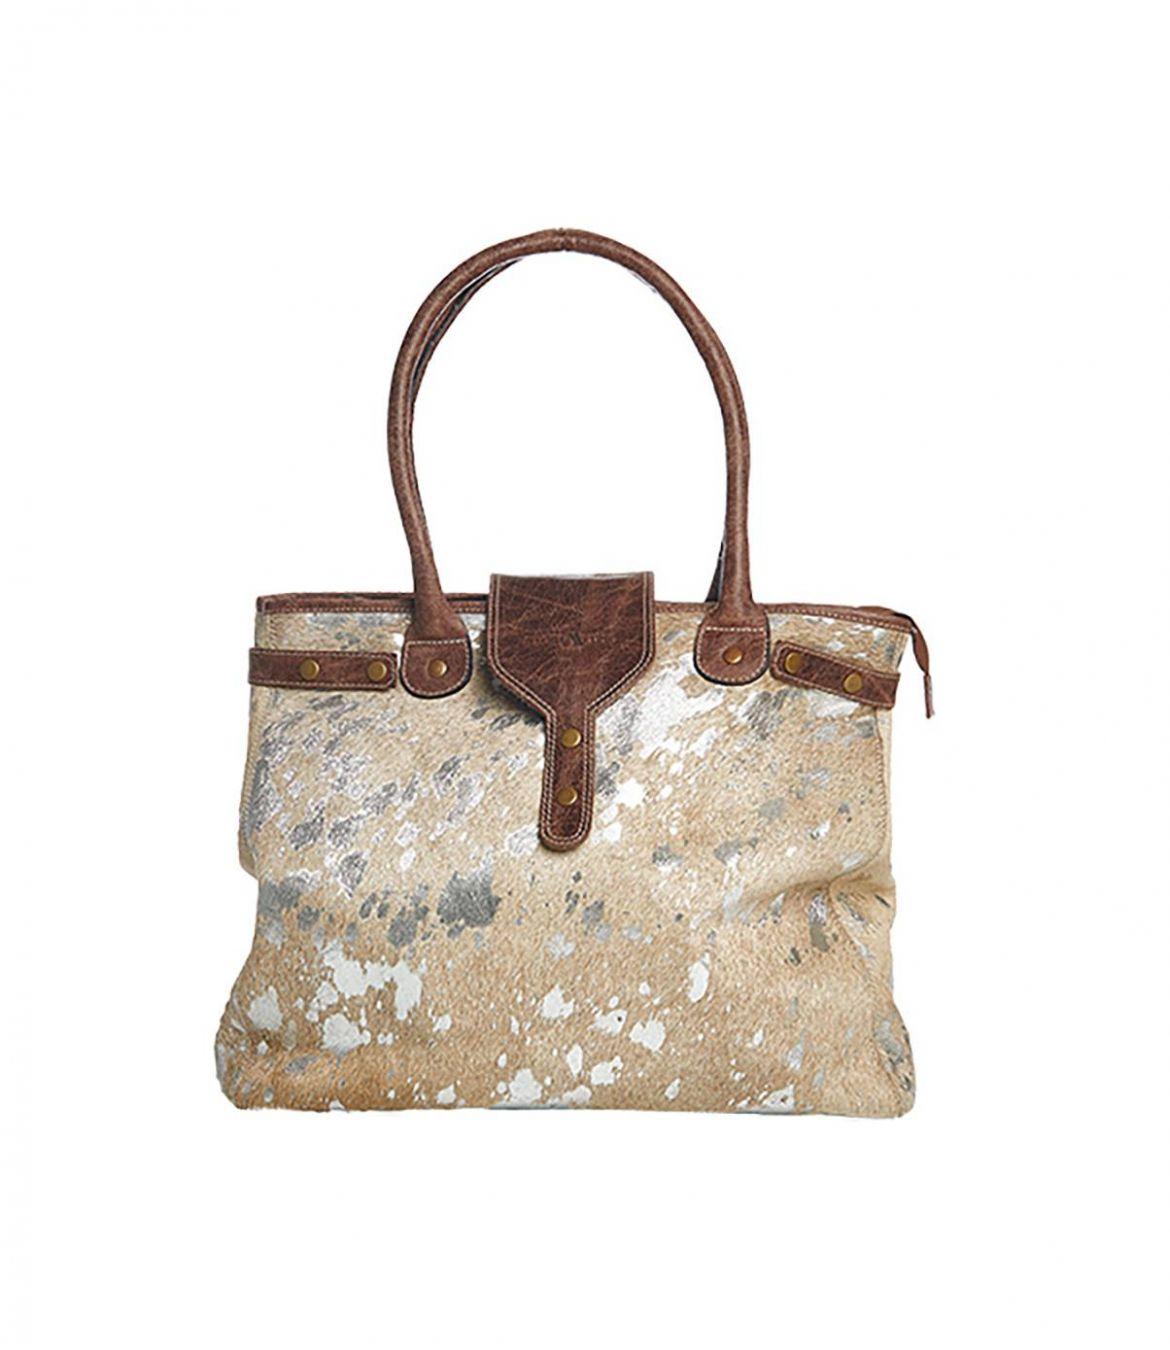 UTOPIC CUIR Women's Leather Bag 40x35 cm Storiatipic - 1